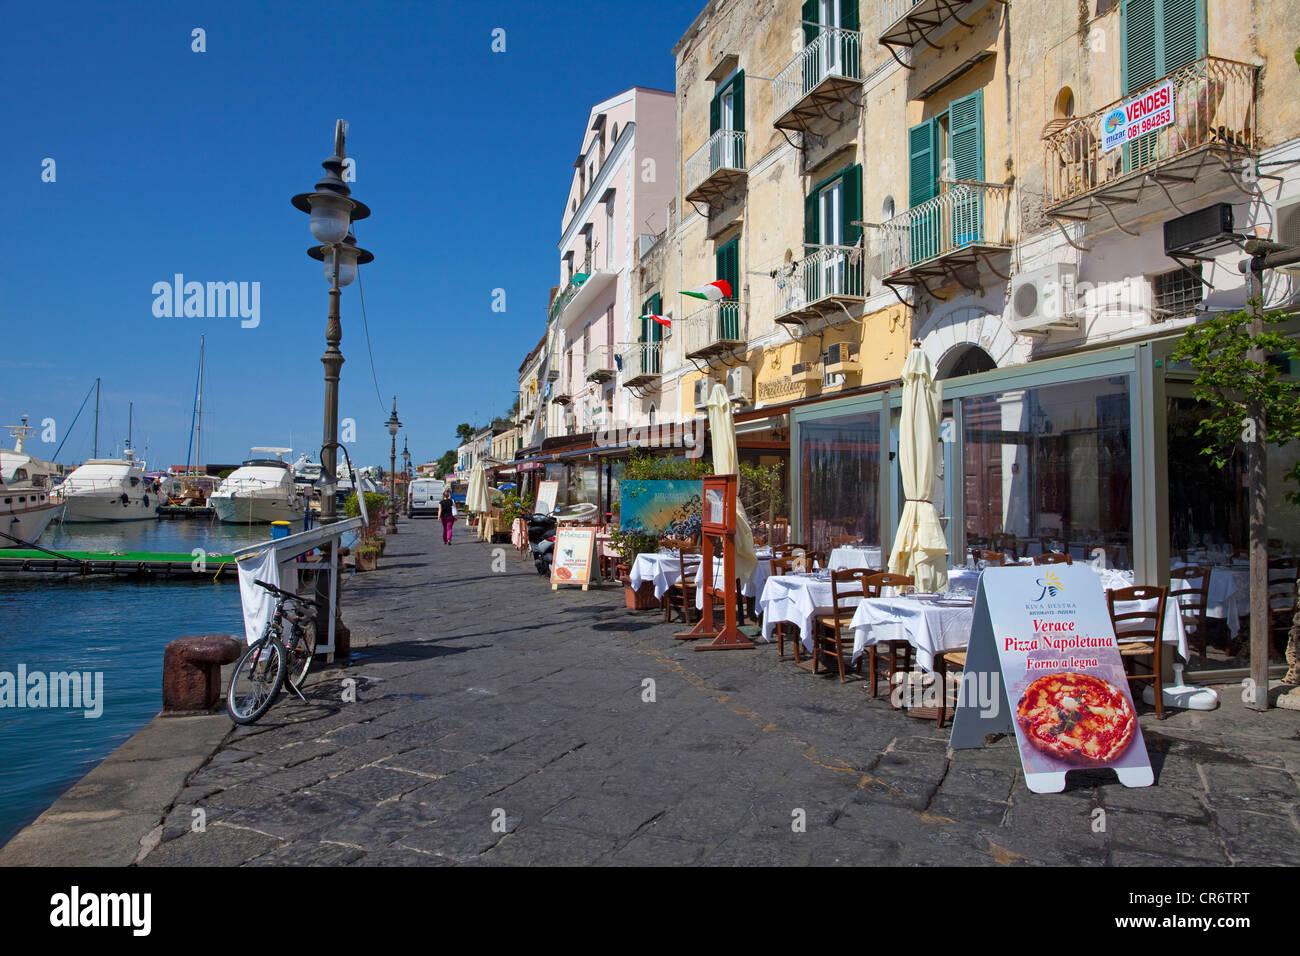 Restaurants at the harbour, Ischia Porto, Ischia, Gulf of Naples, Campania region, Italy, Europe - Stock Image